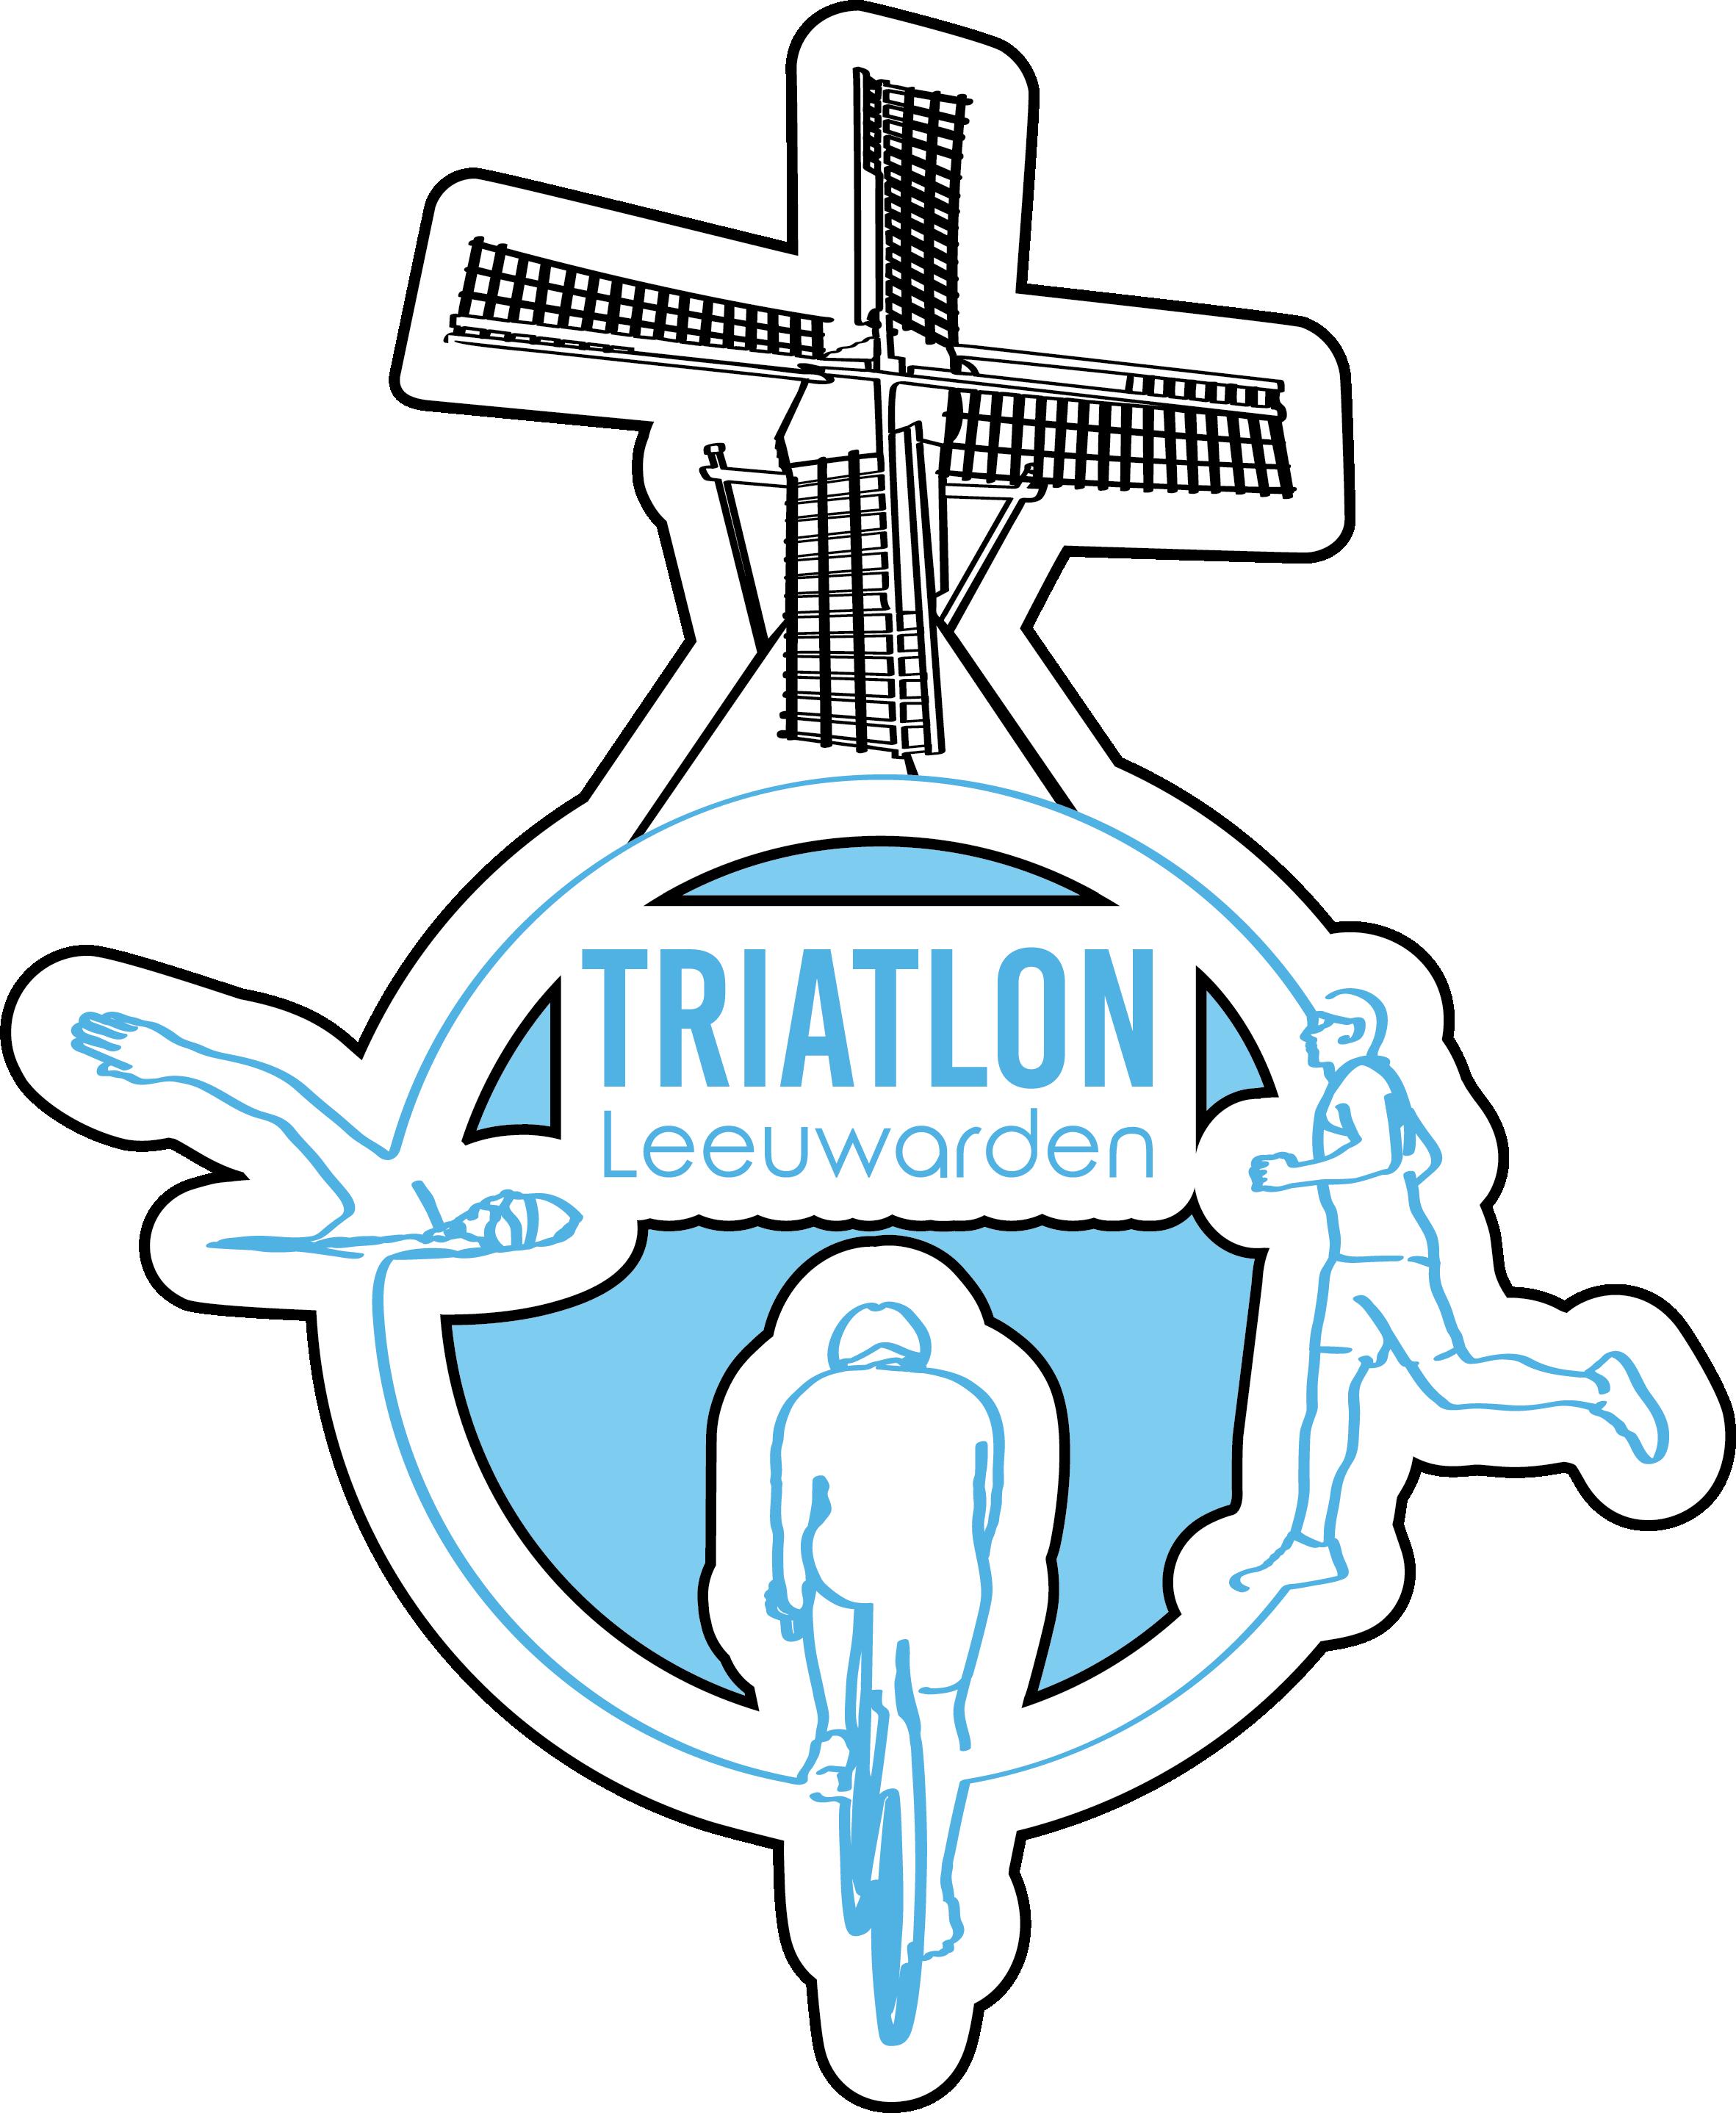 Triatlon Leeuwarden